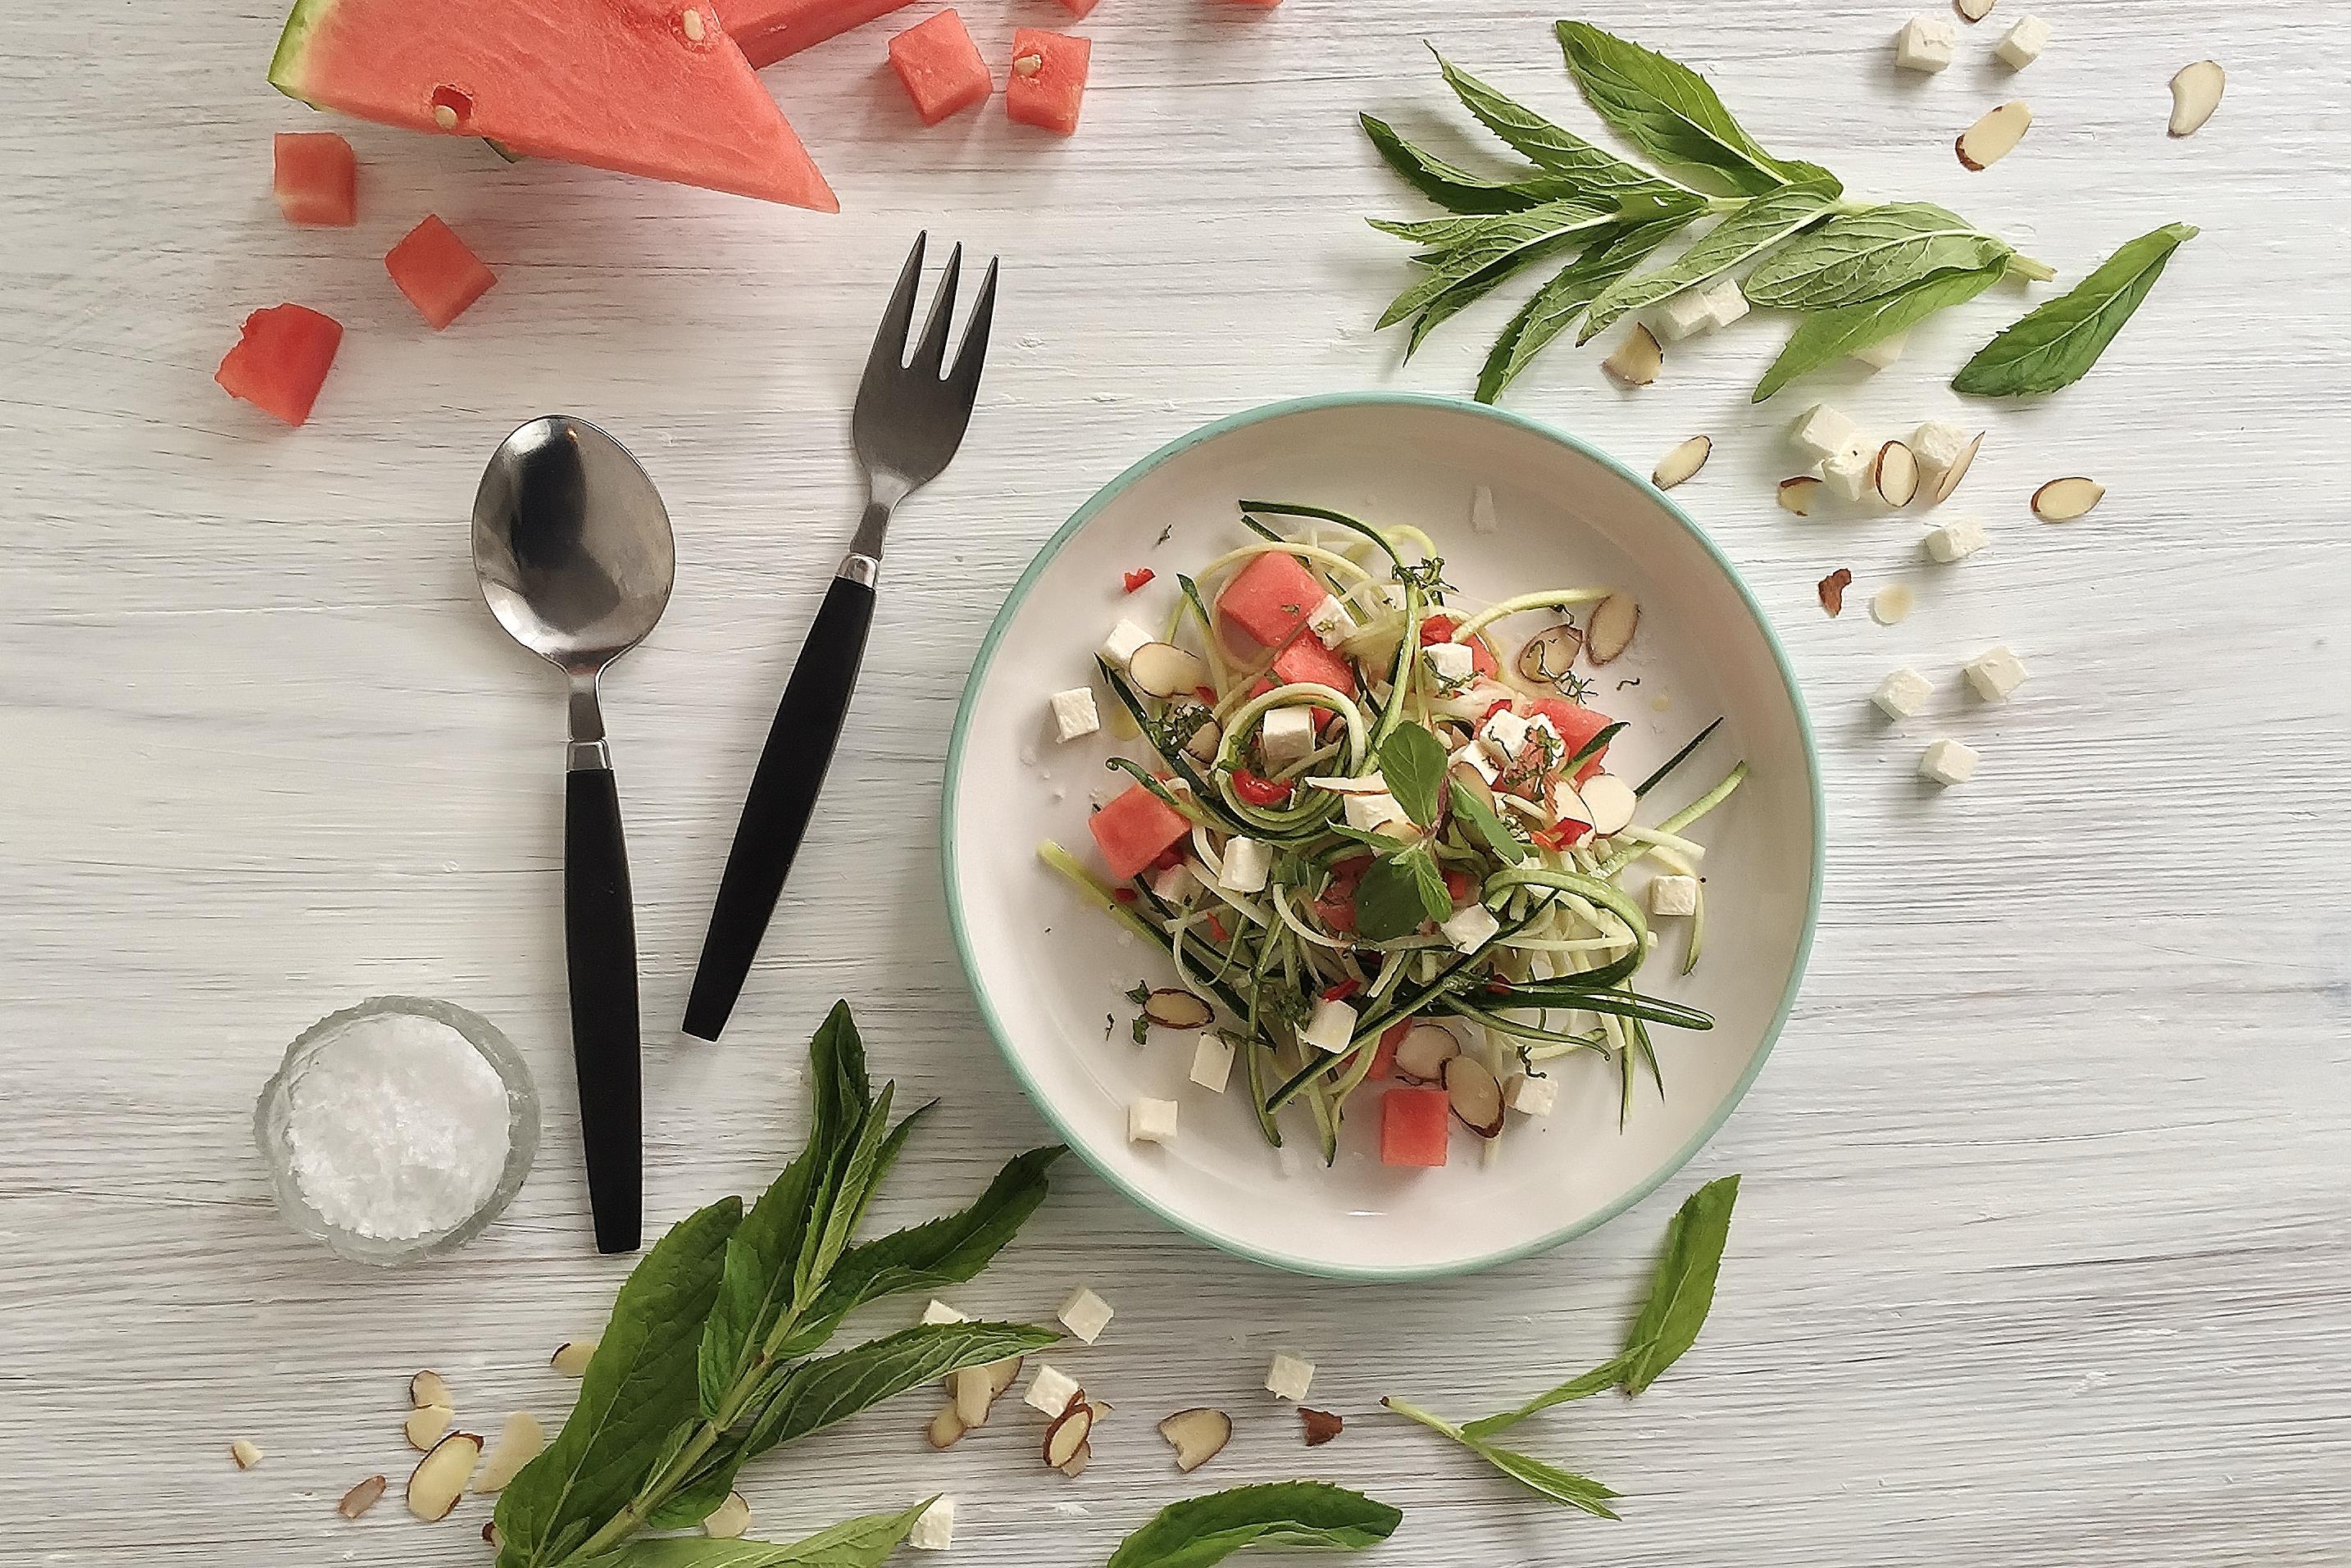 Summer Salad with Watermelon, Squash & Feta